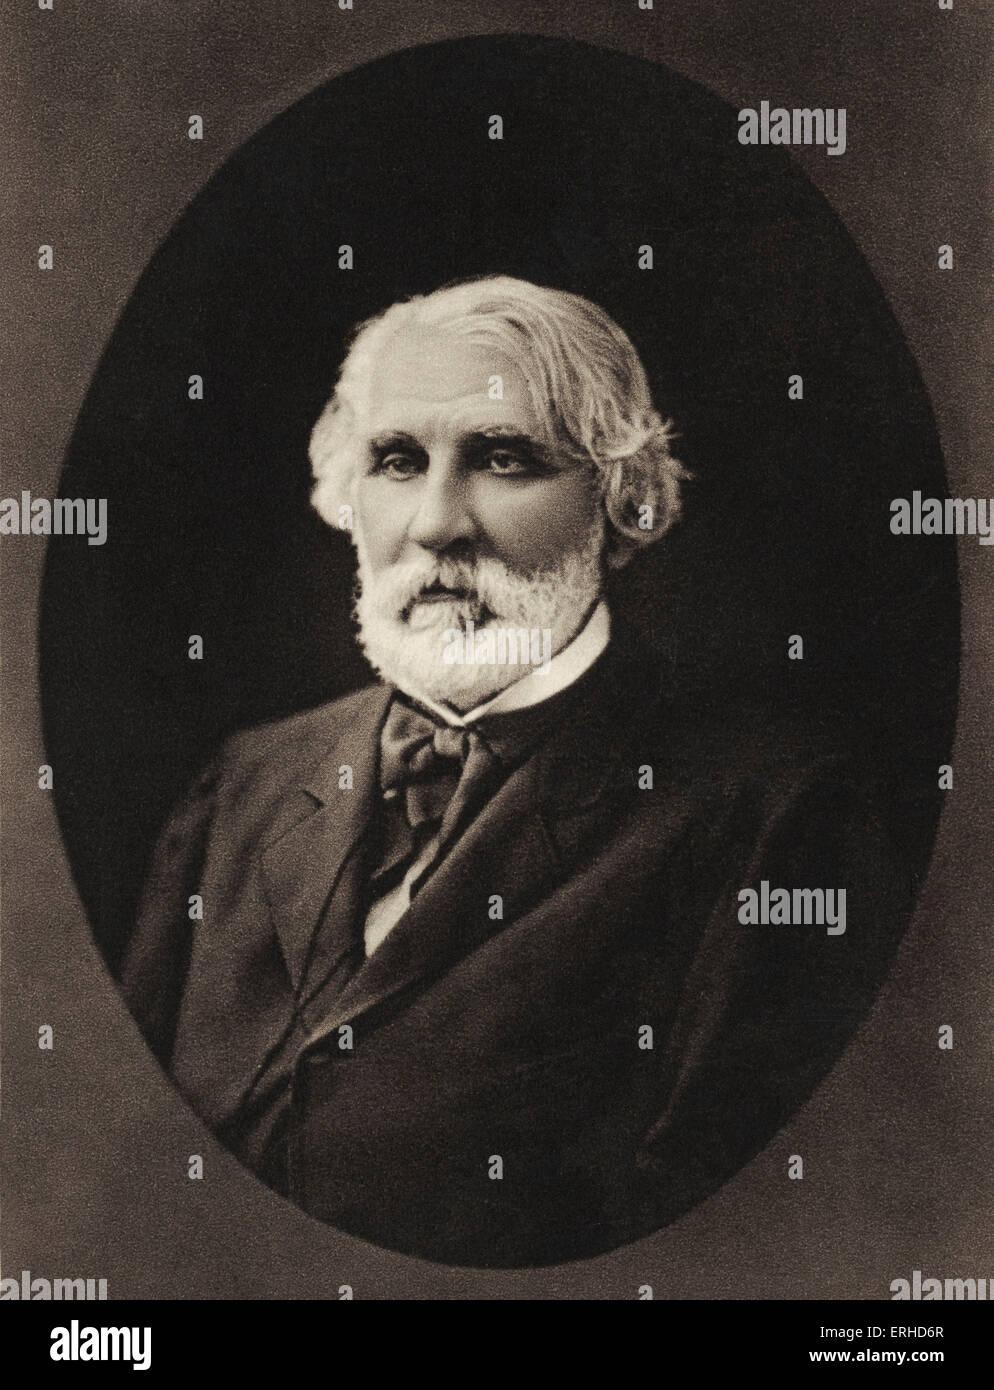 Ivan Turgenev  - portrait. Russian playwright 1818-1883 - Stock Image